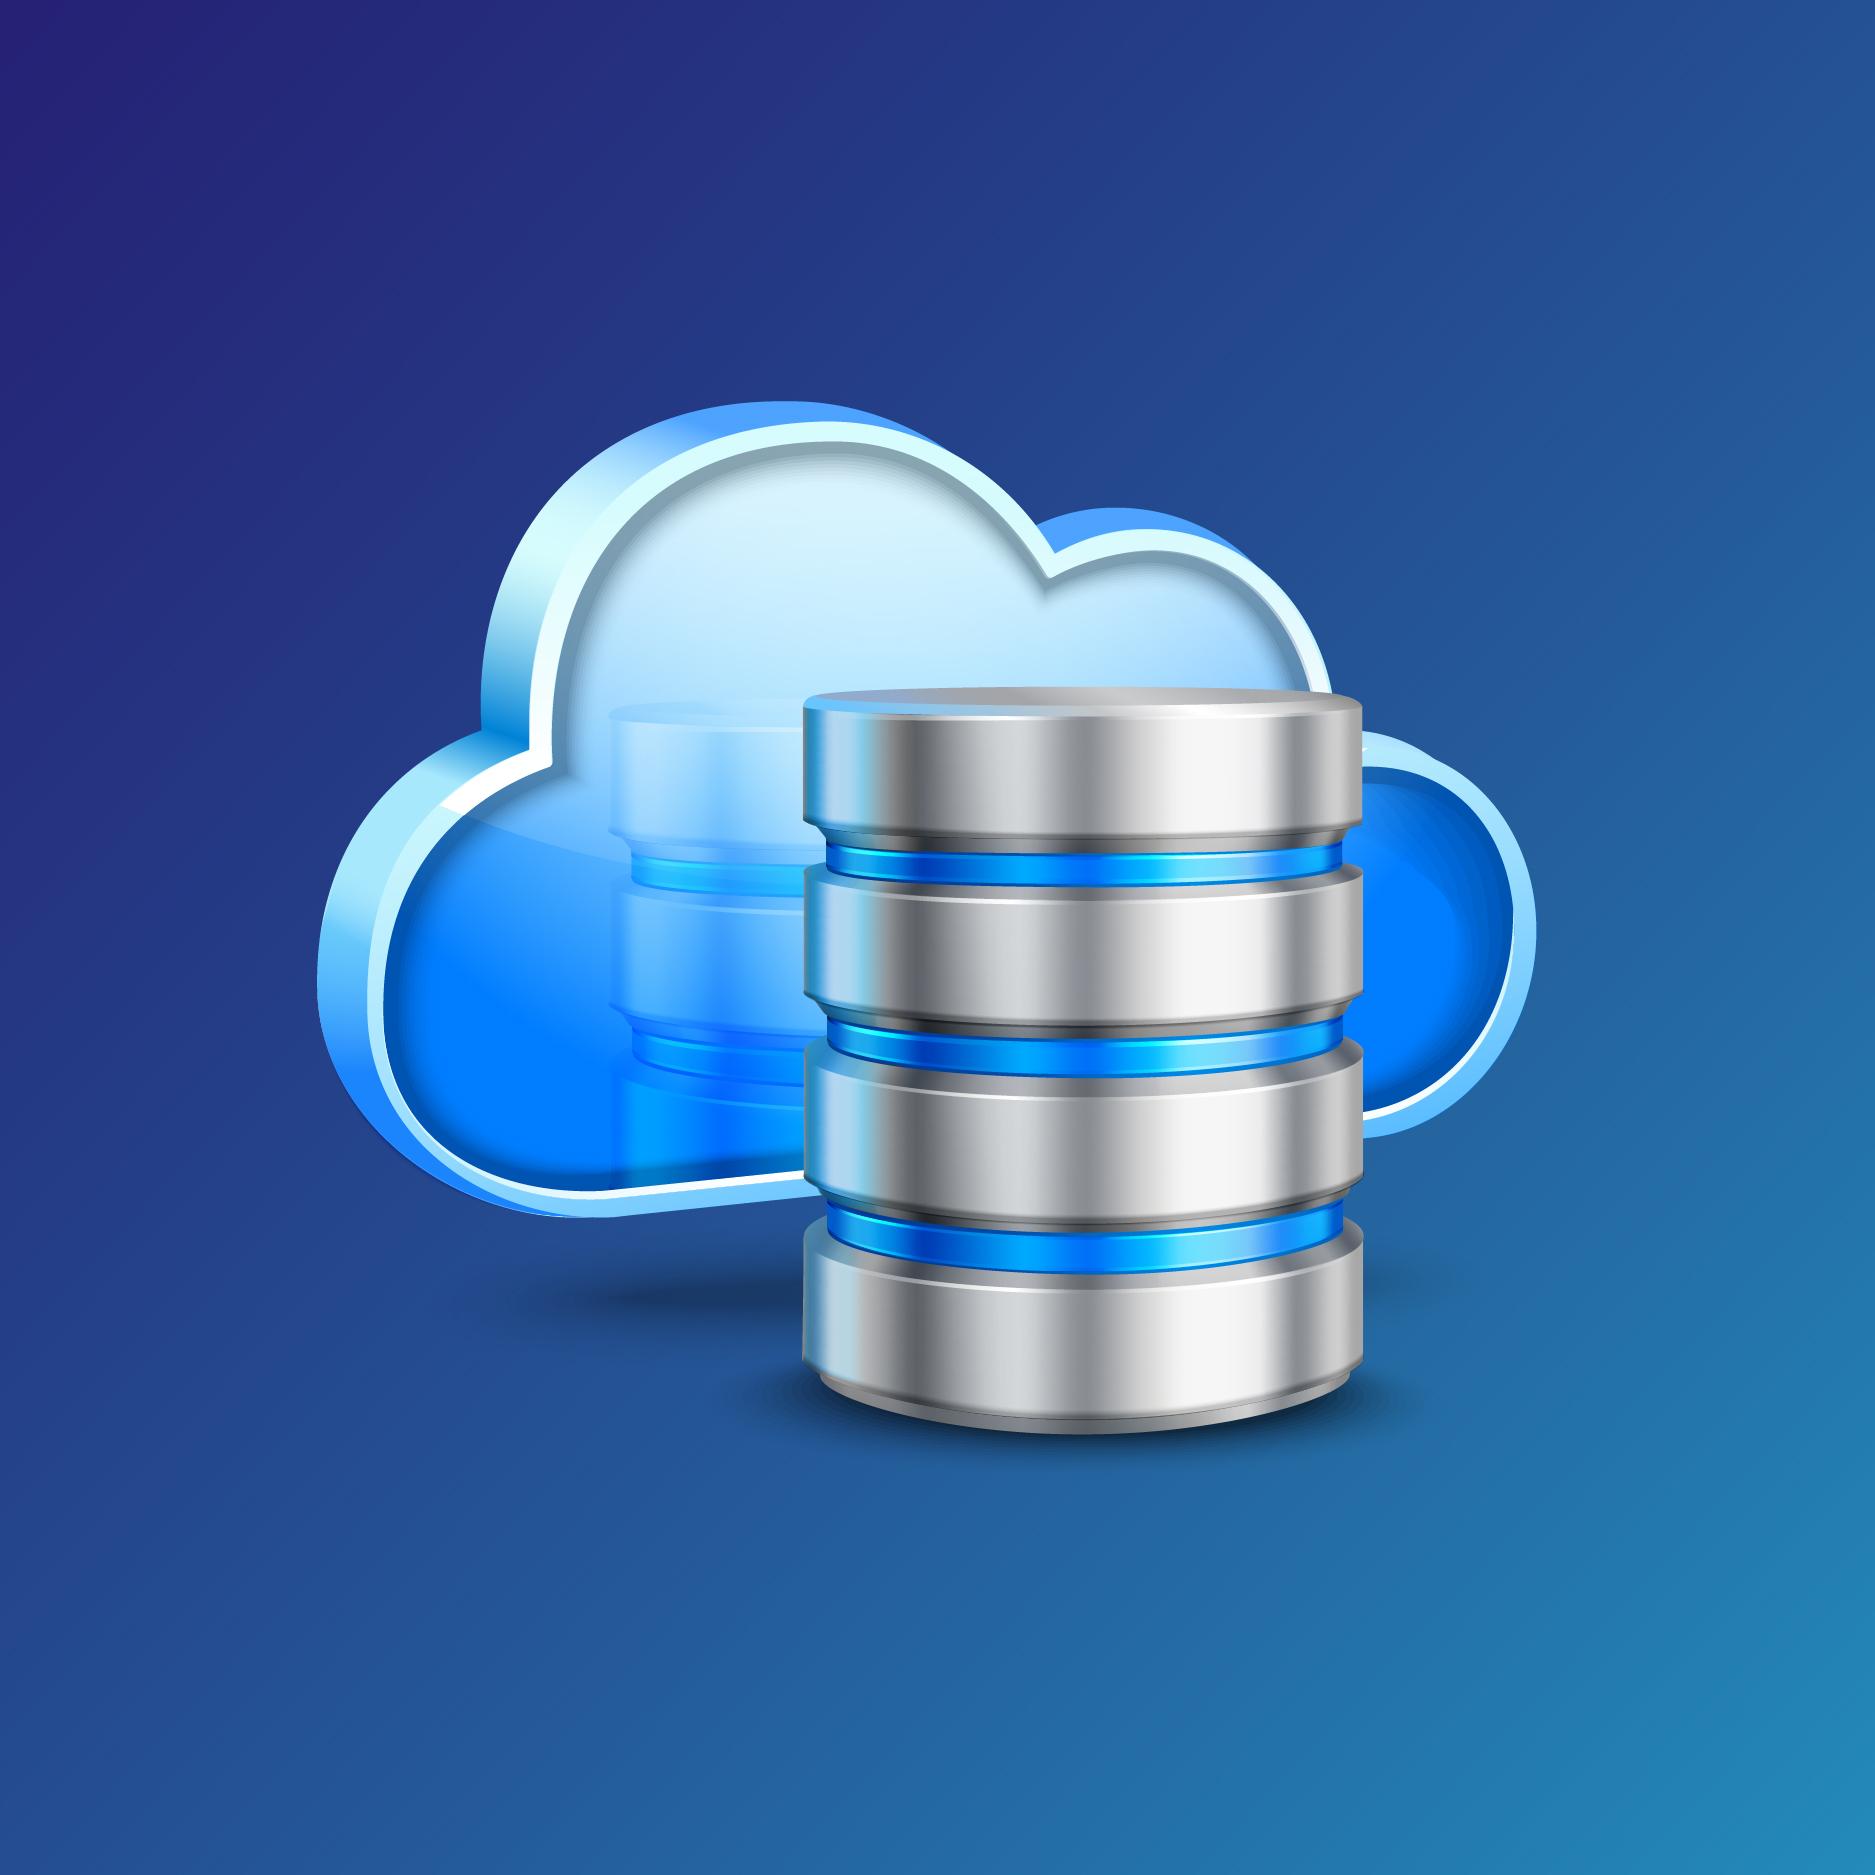 Timestamping in Database Management System